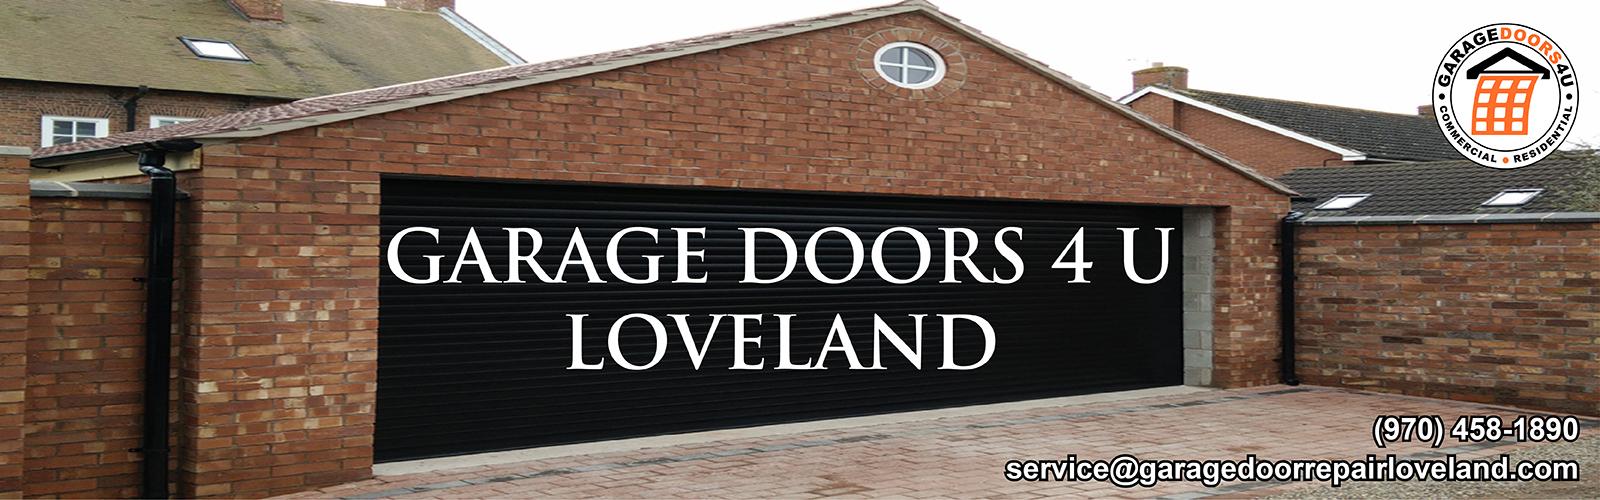 GARAGE DOORS 4U LOVELAND-01.jpg